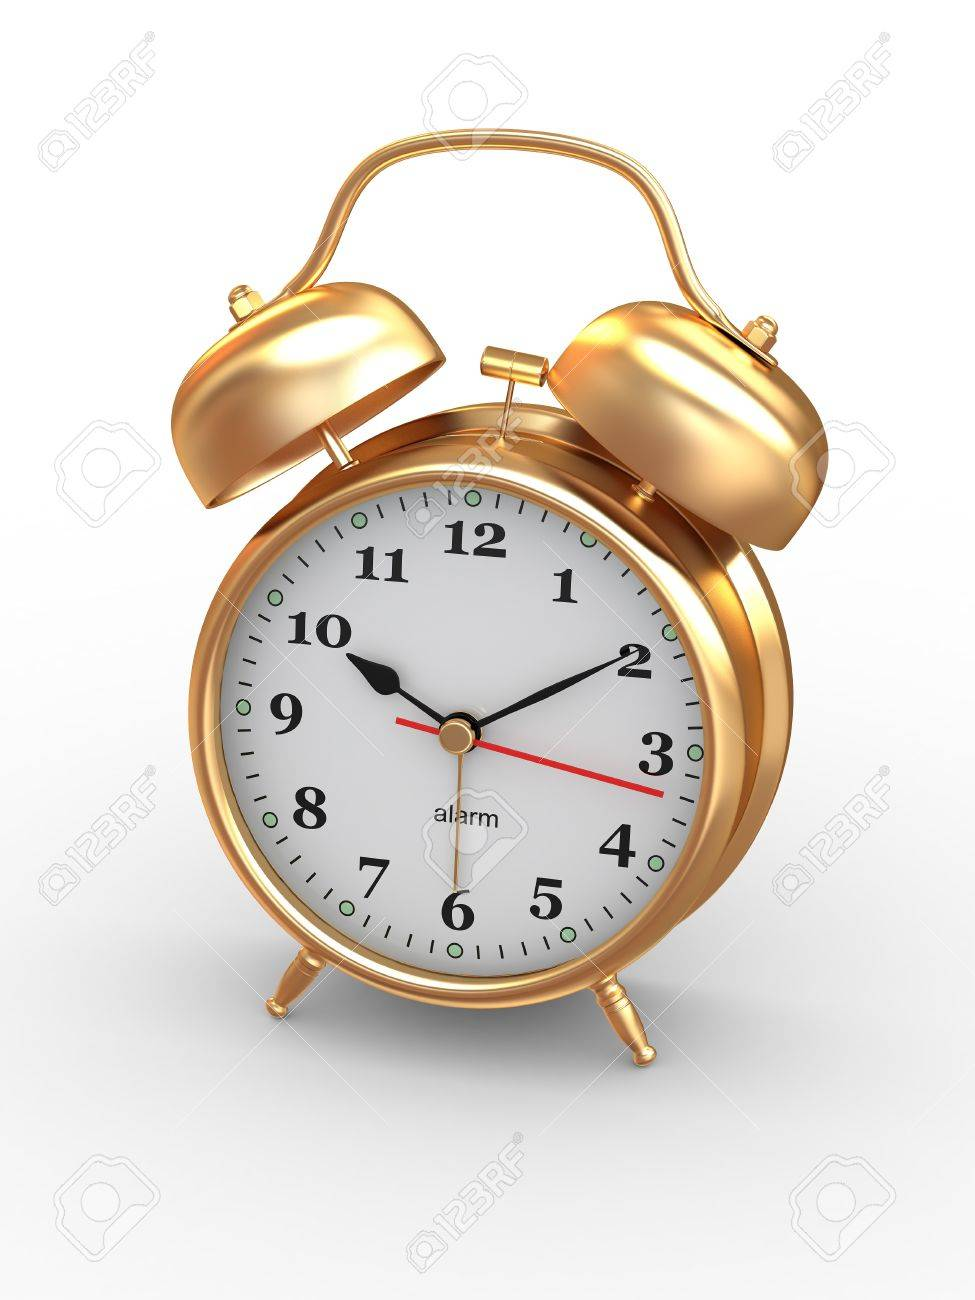 Majestic 12766488 Ten O Clock Fashioned Alarm Clock On Background 3d Fashioned Alarm Clock App Fashioned Alarm Clock Pink houzz-02 Old Fashioned Alarm Clock